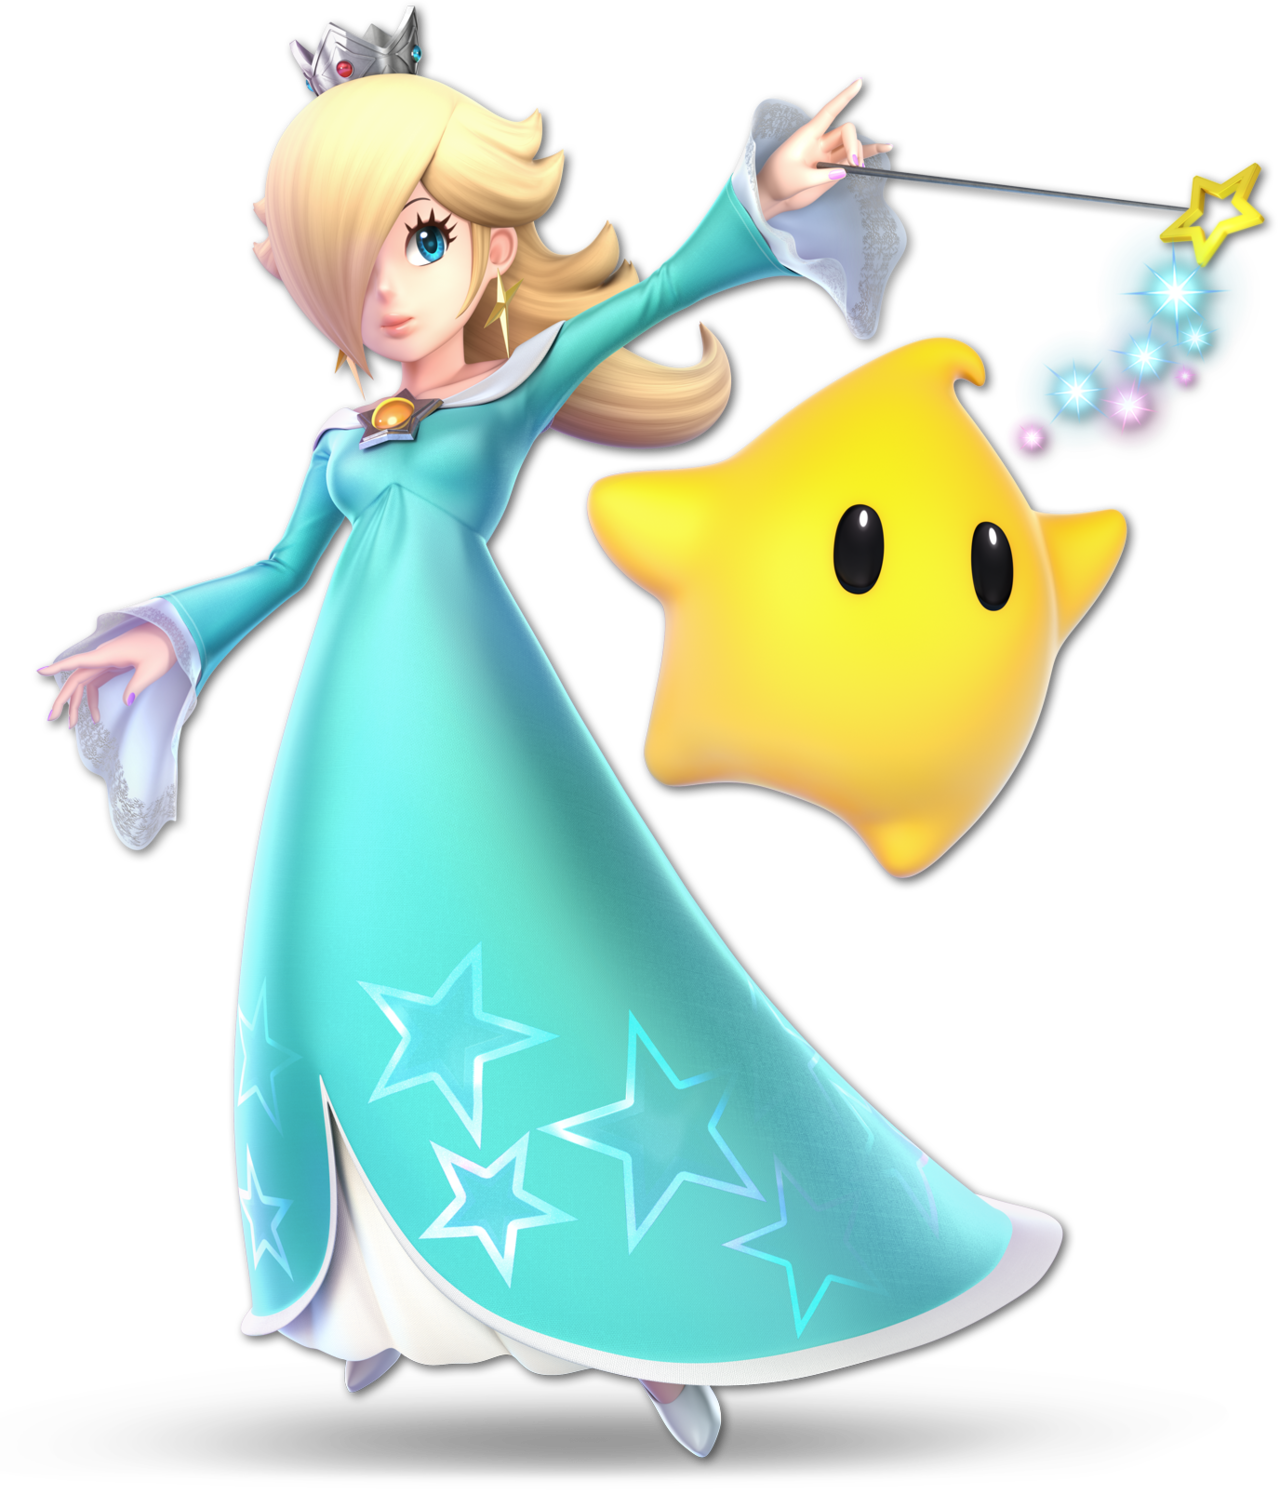 Rosalina & Luma (Super Smash Bros. Ultimate)